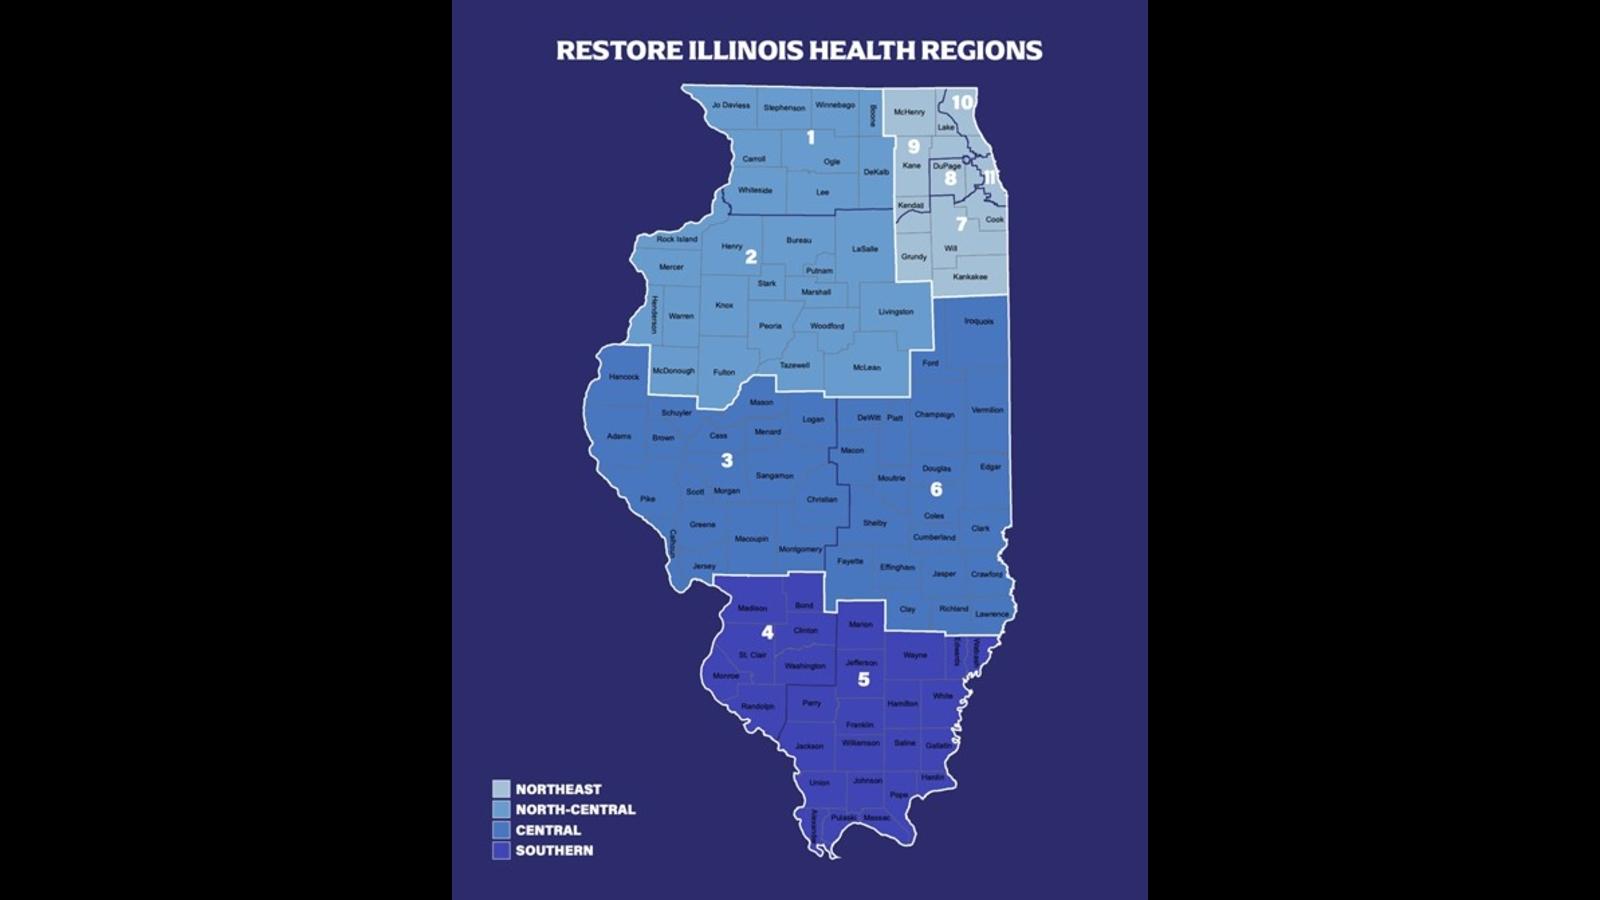 6153711 050520 wls restore illinois map img jpg?w=1600.'